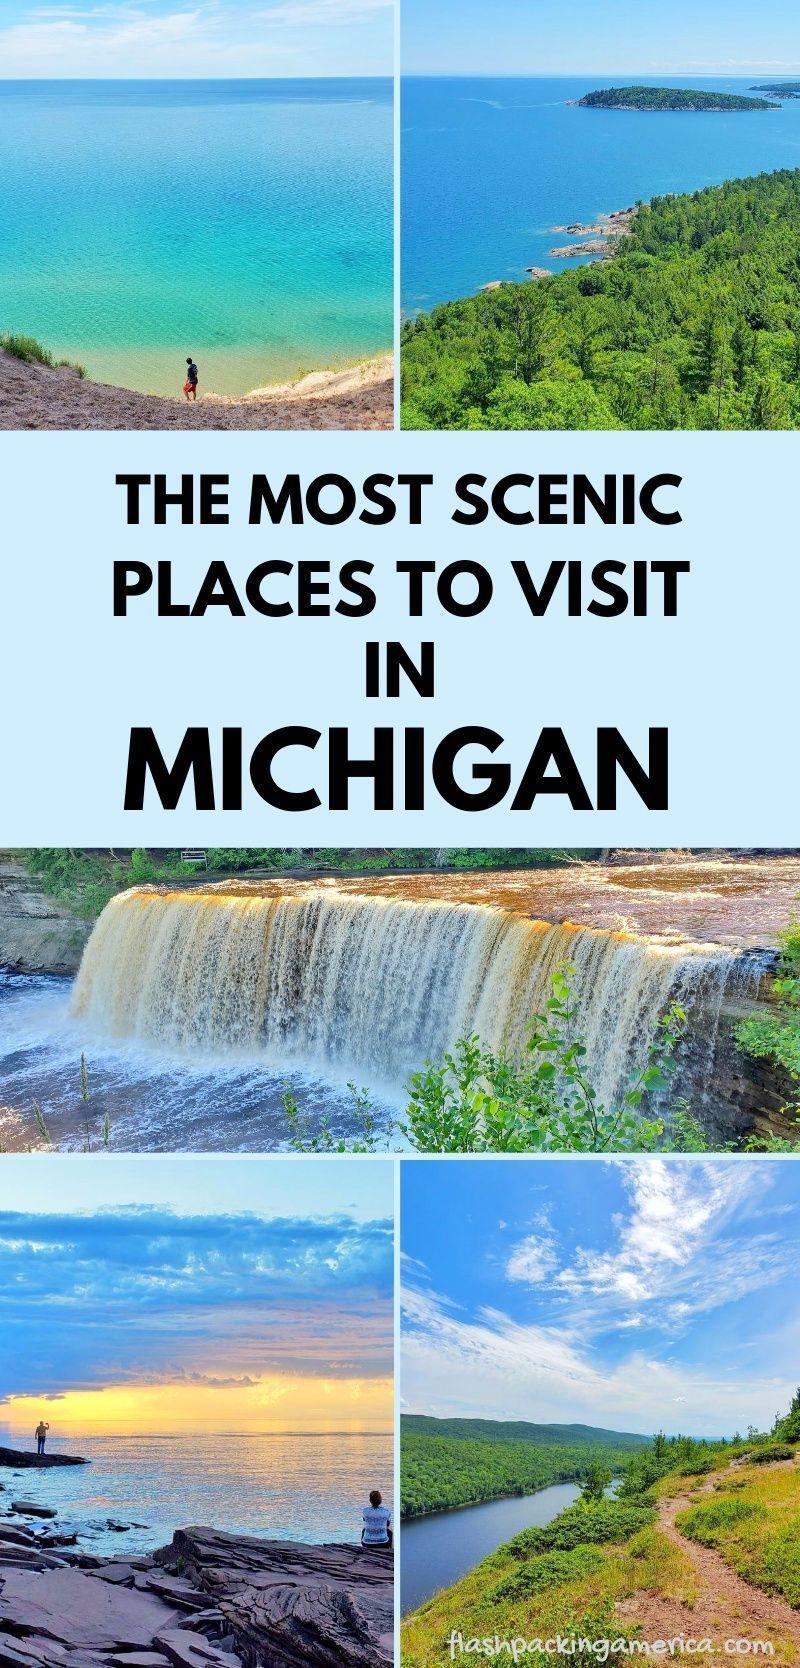 9 Places To Visit In Upper Peninsula Circle The Up Michigan Road Trip Around The Great Lakes Michigan Travel Blog Flashpacking America Michigan Road Trip Michigan Travel Wisconsin Travel